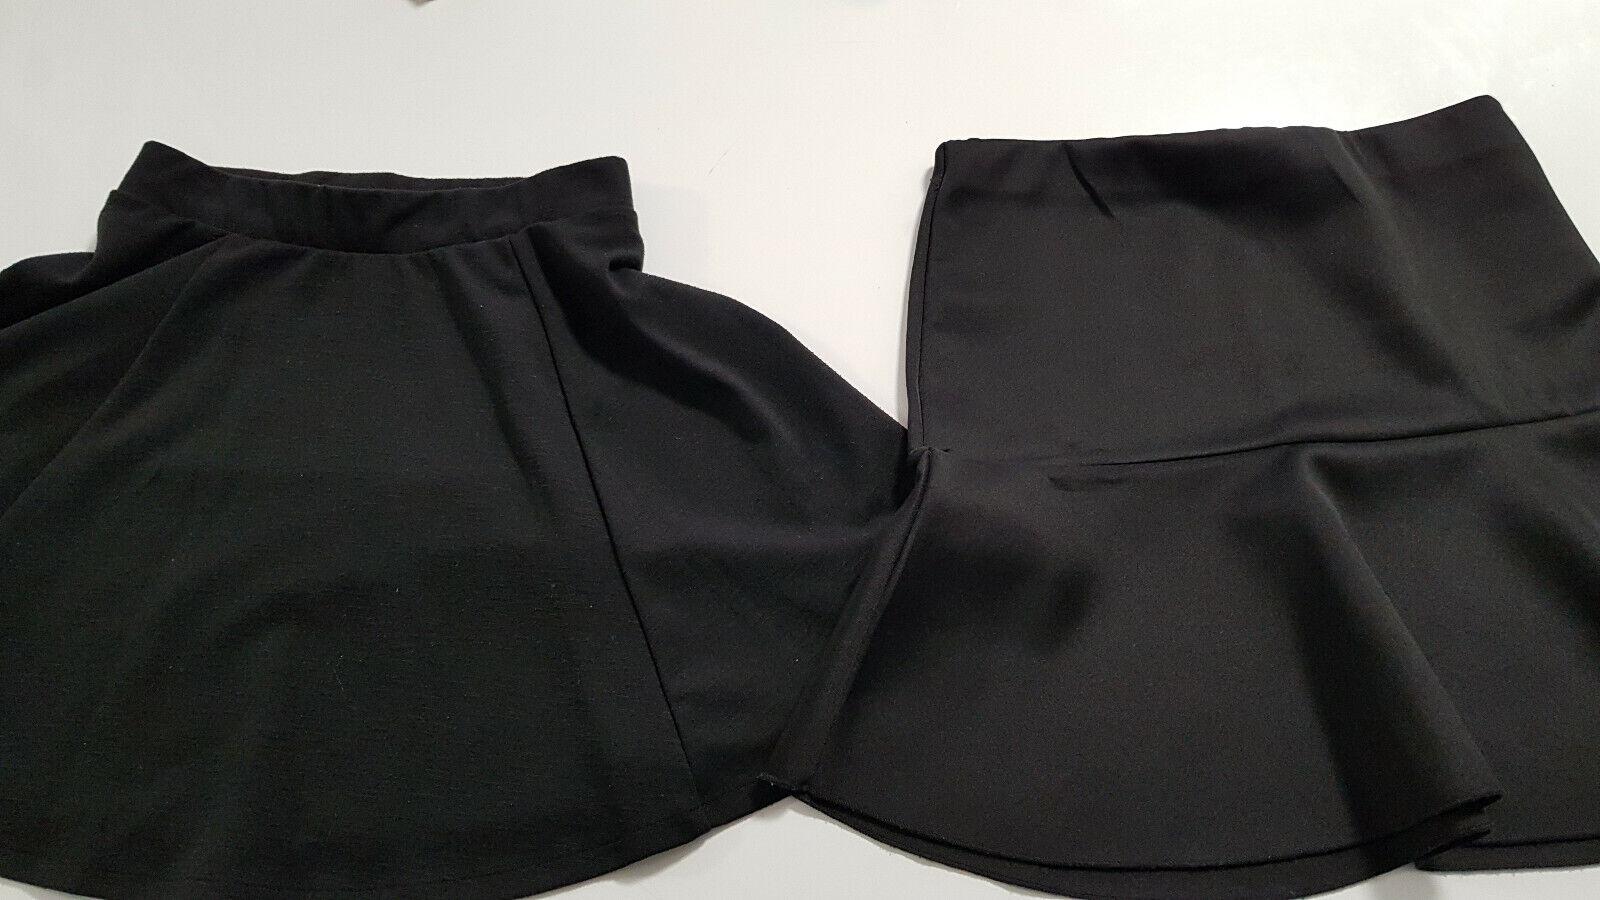 2 Röcke Mini in Schwarz Gr S H&M und FB Sister Rock